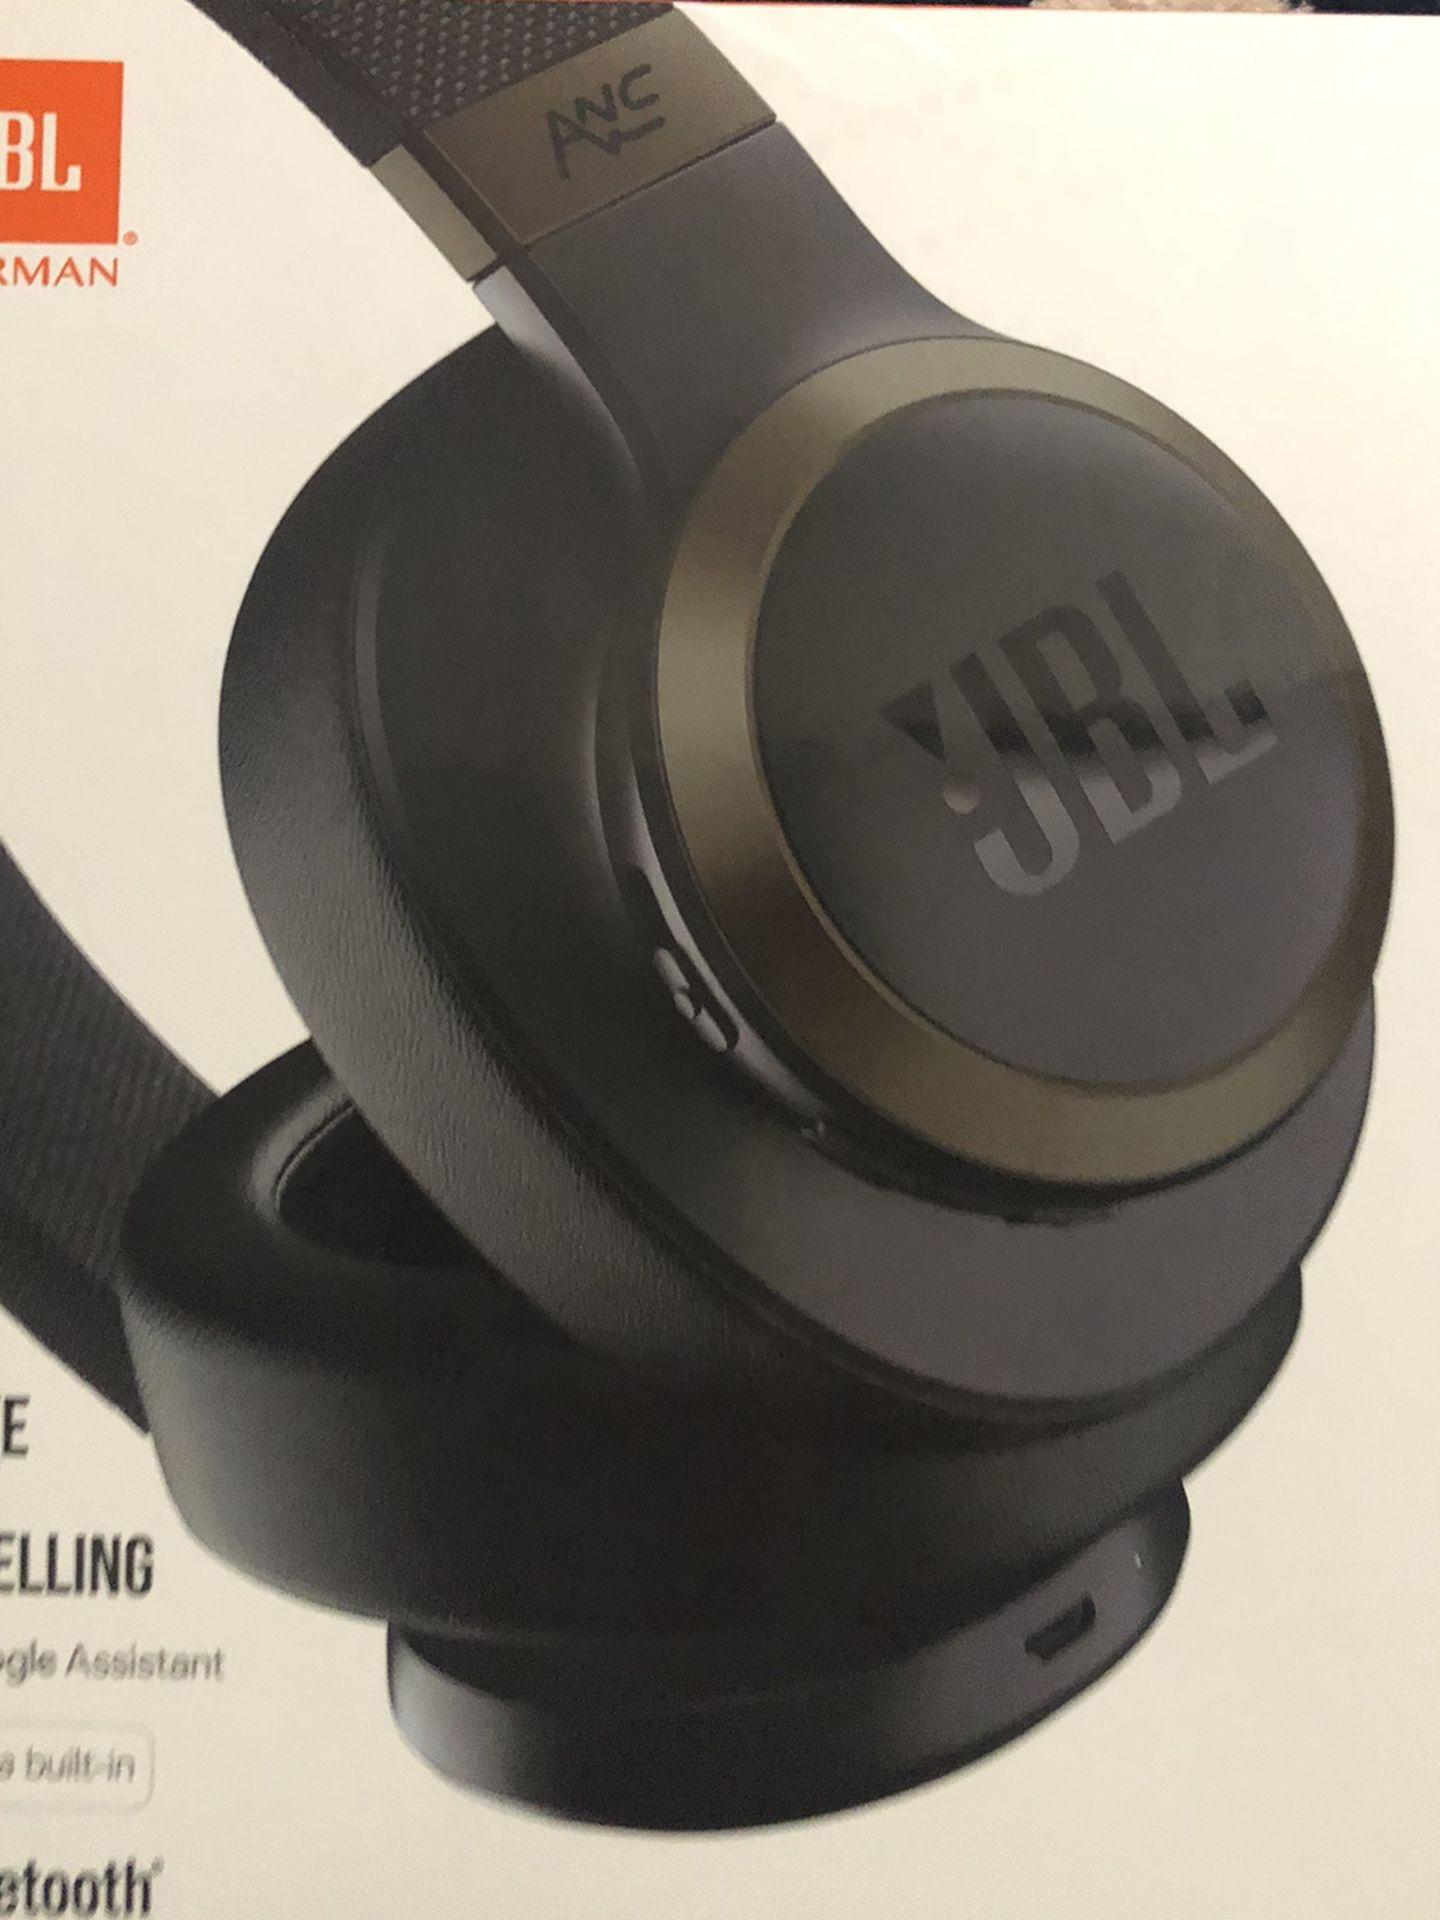 JBL LIVE650BT Wireless Bluetooth Headset Brand New Openbox